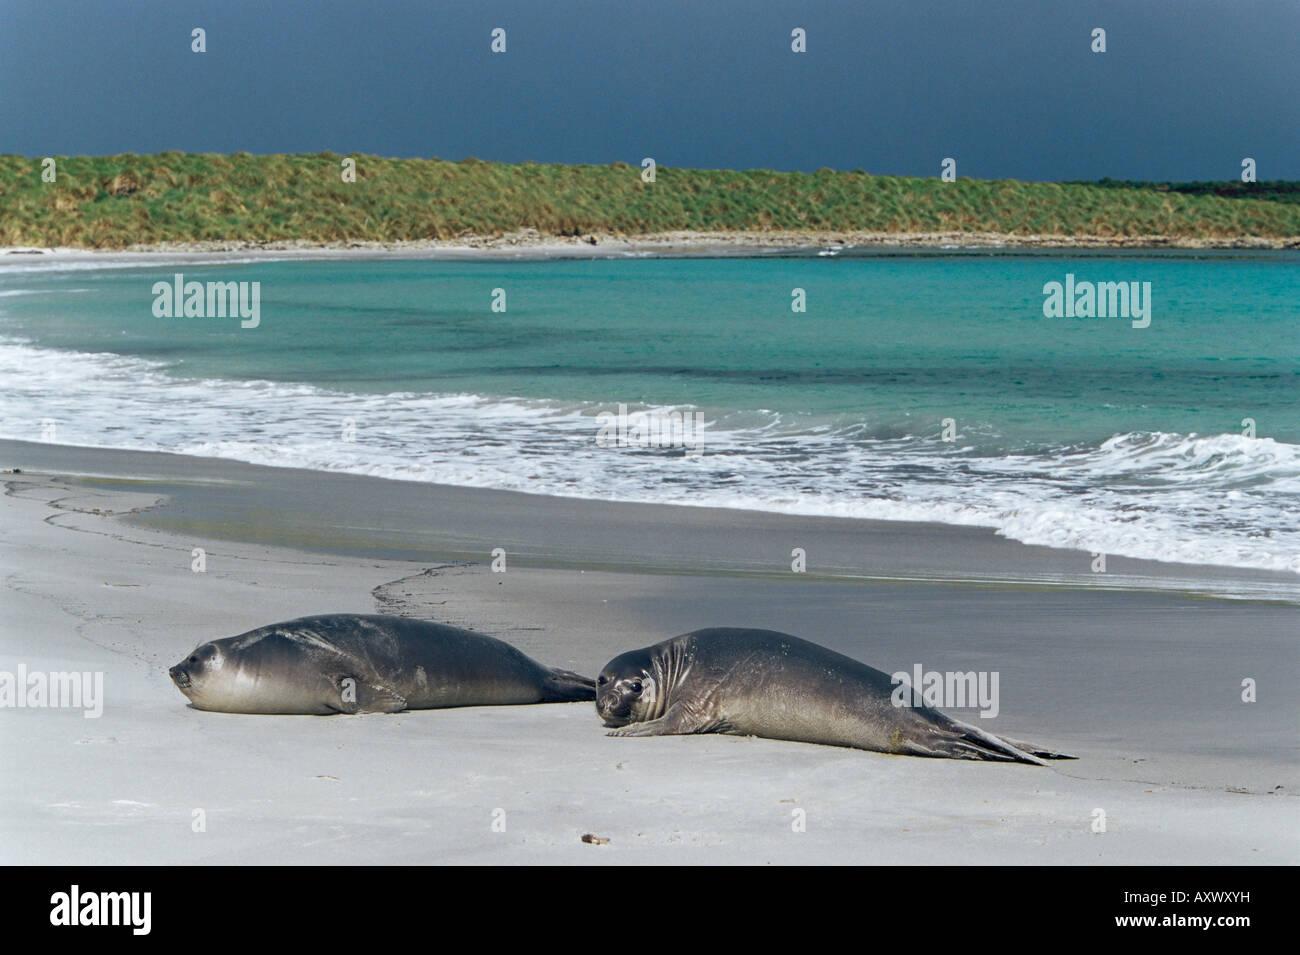 Elefant dichtet entspannen am Strand, Sea Lion Island, Falkland-Inseln, Süd-Atlantik, Süd-Amerika Stockbild